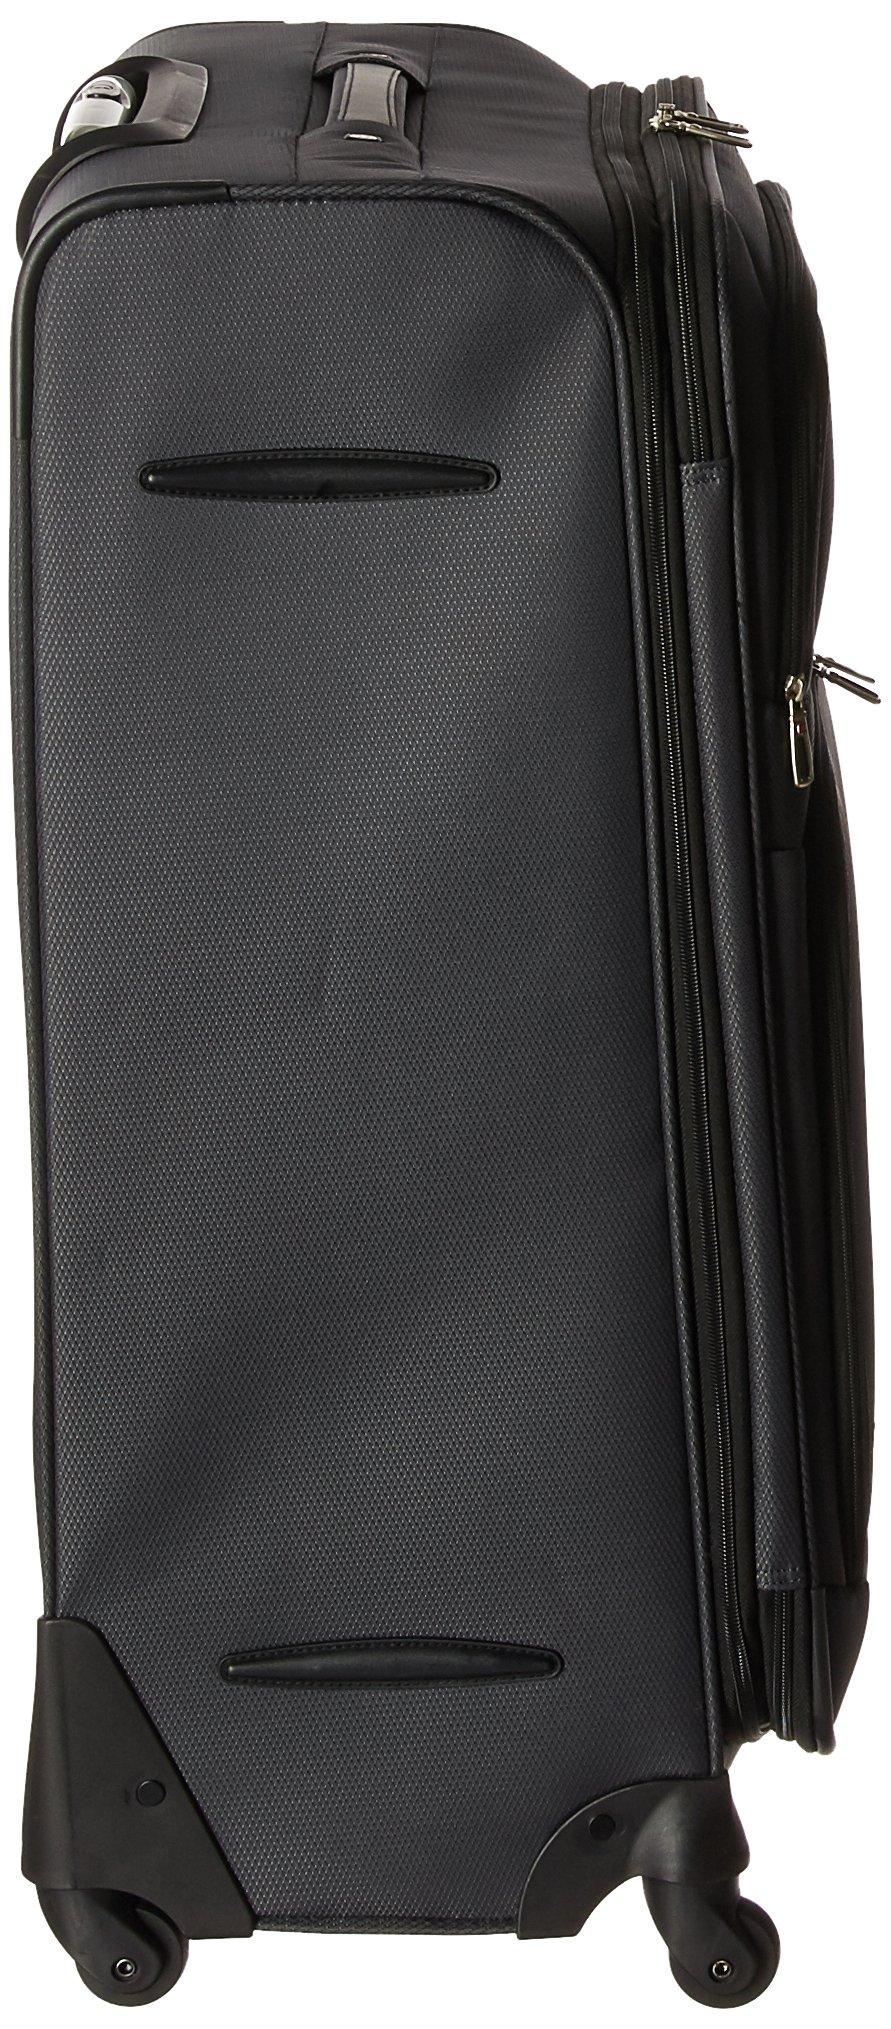 SwissGear Maggiore 28'' Suitcase, Grey by SwissGear (Image #3)